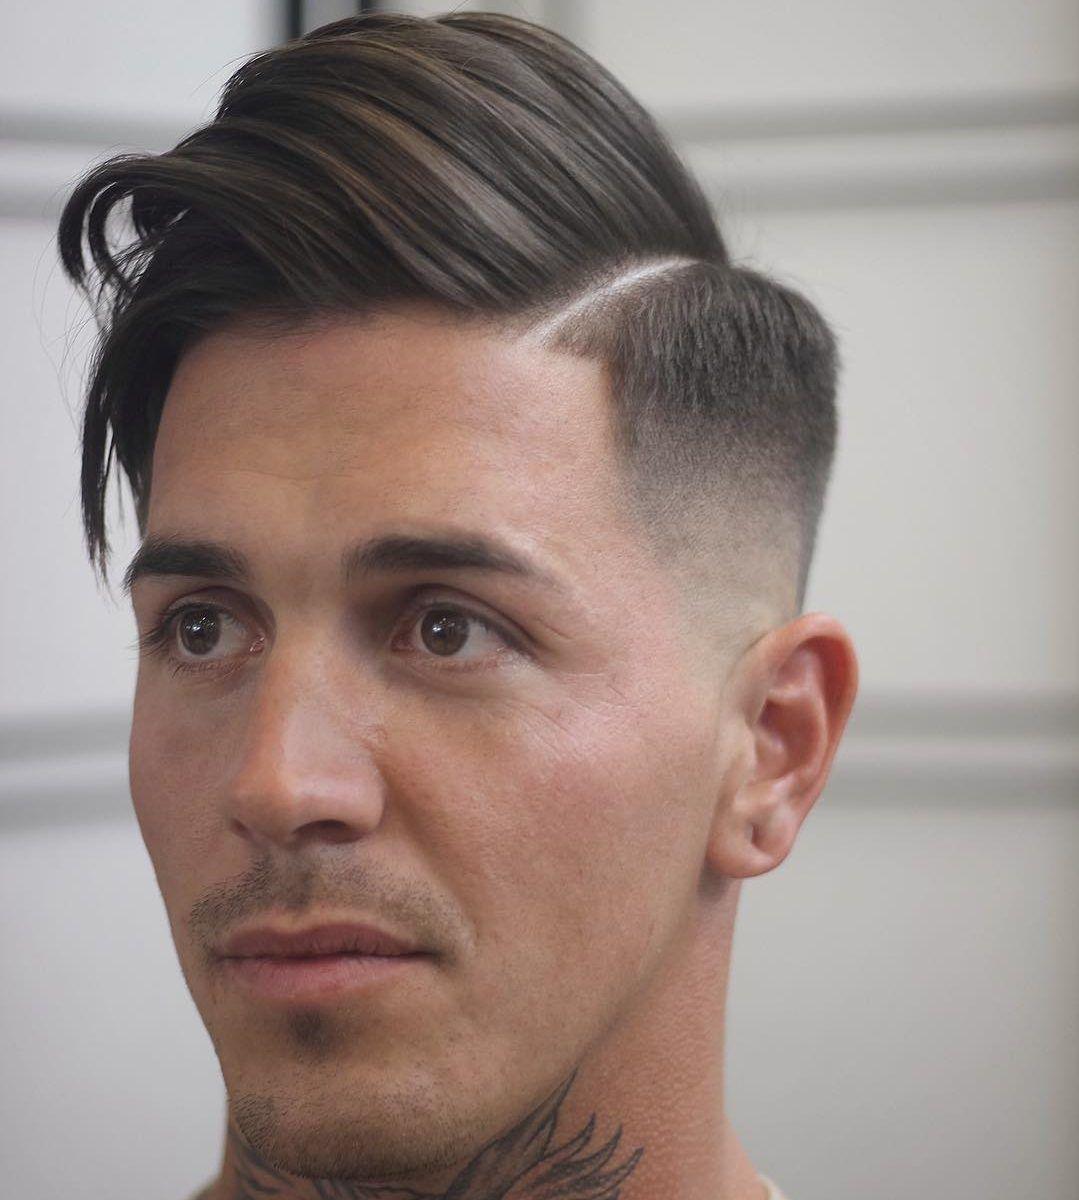 Medium haircuts for men medium hairstyles for men  medium hairstyles for men